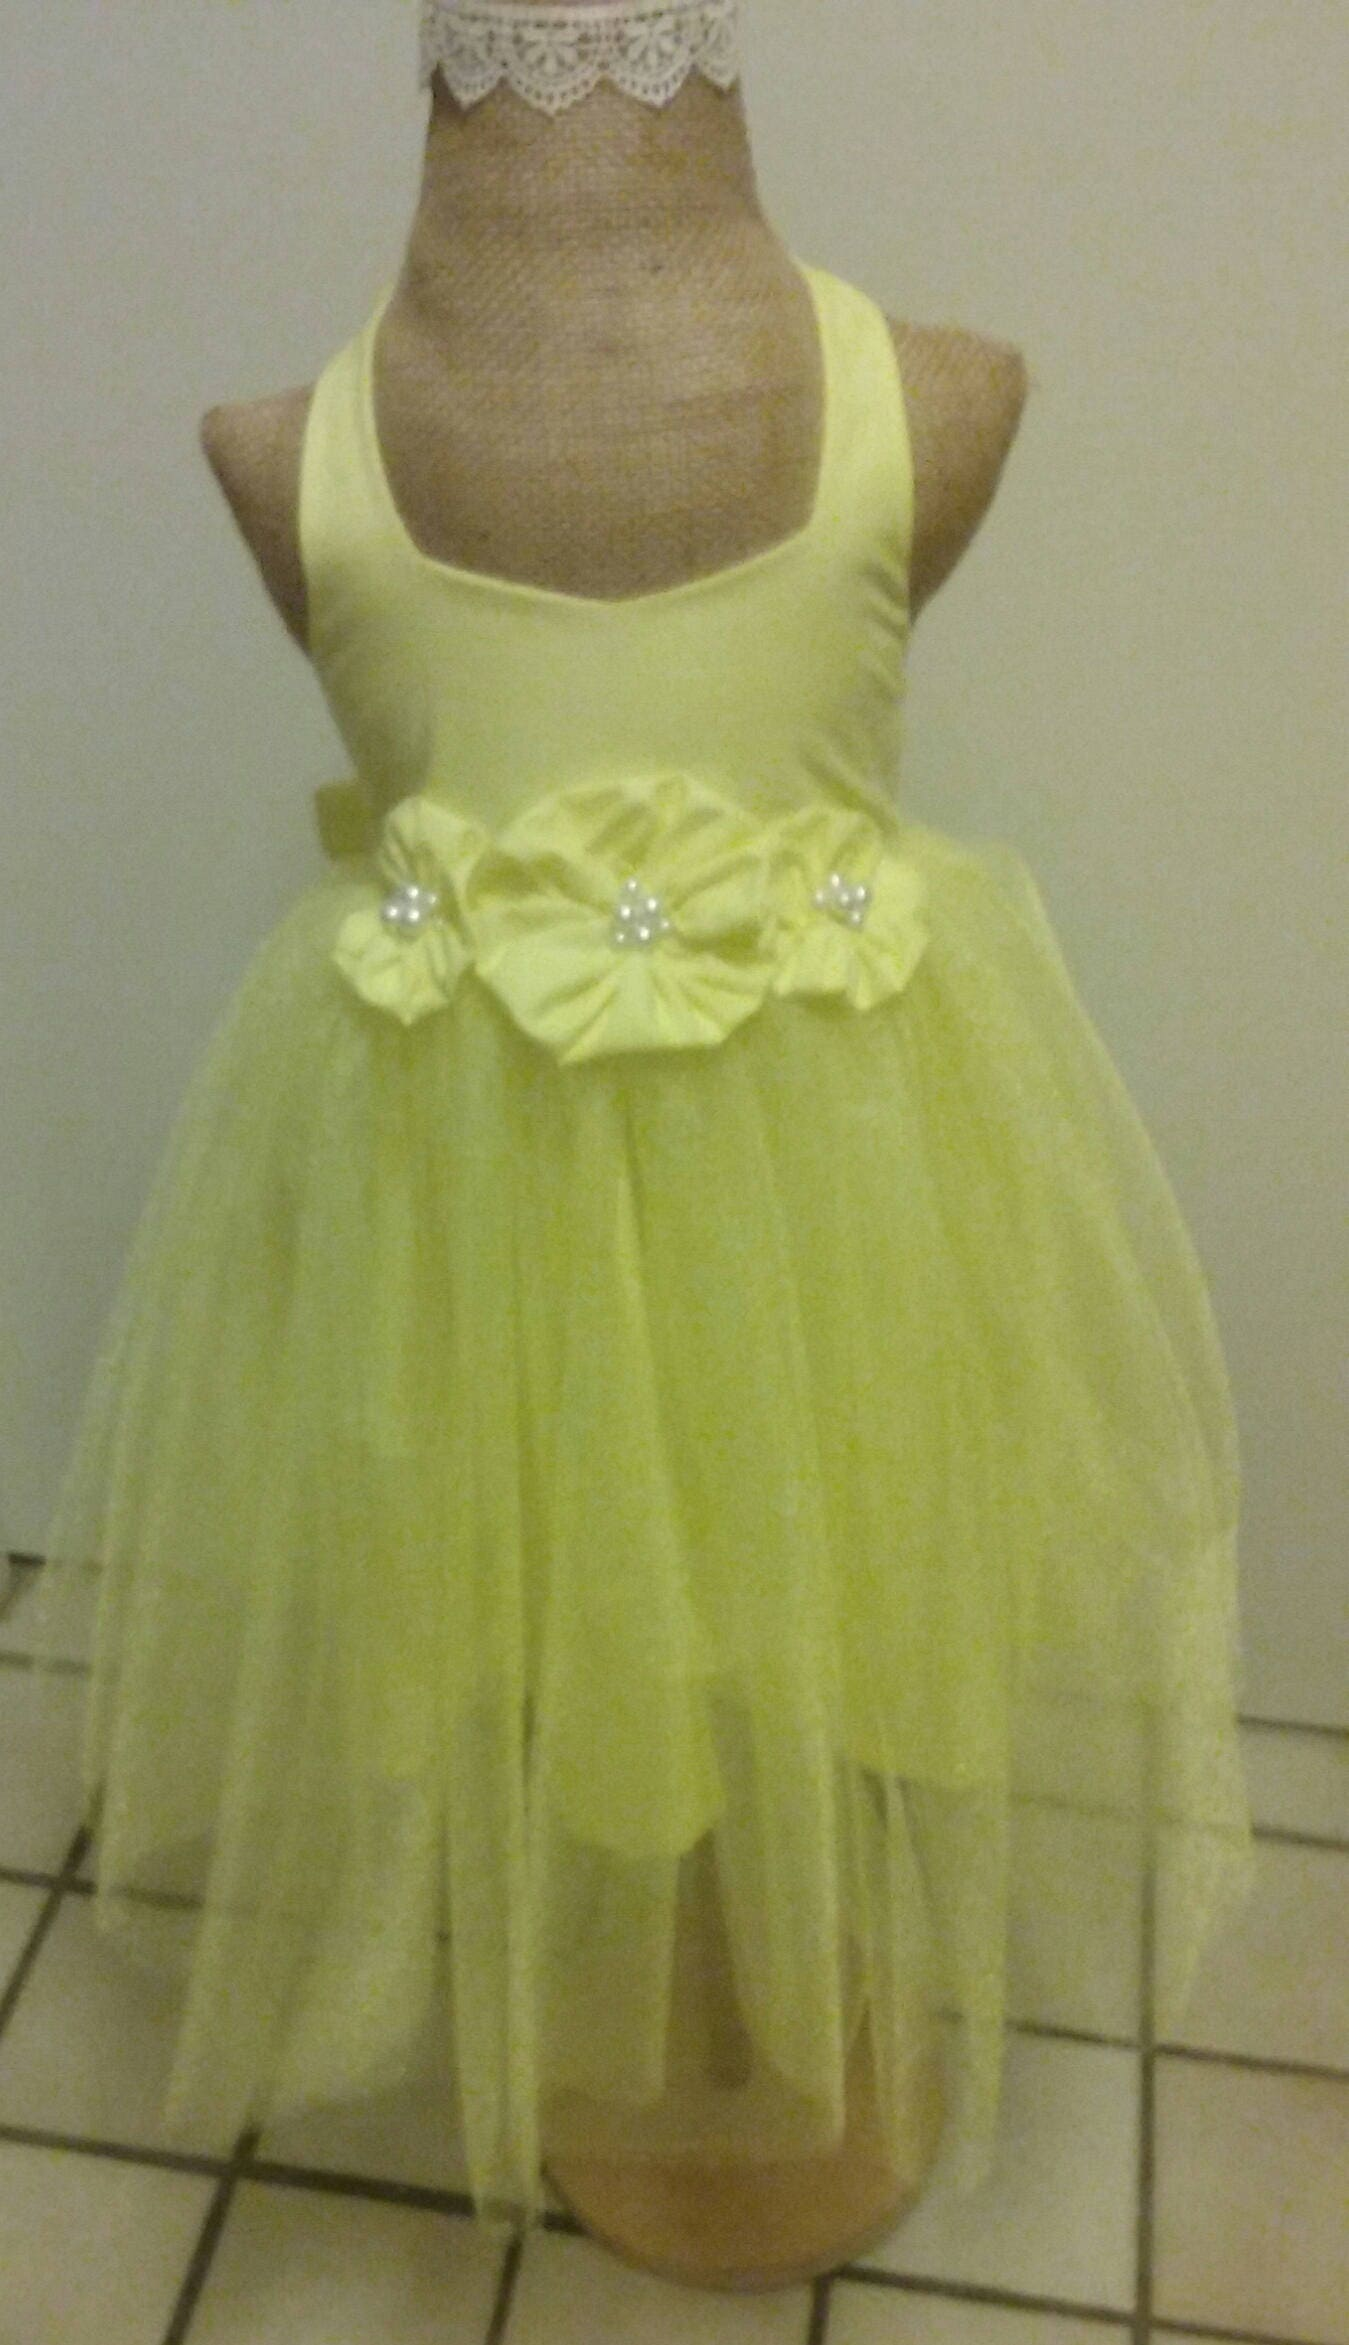 Lemon Yellow Natural Cotton Tutu Flower Girl Dress Fabric Flowers